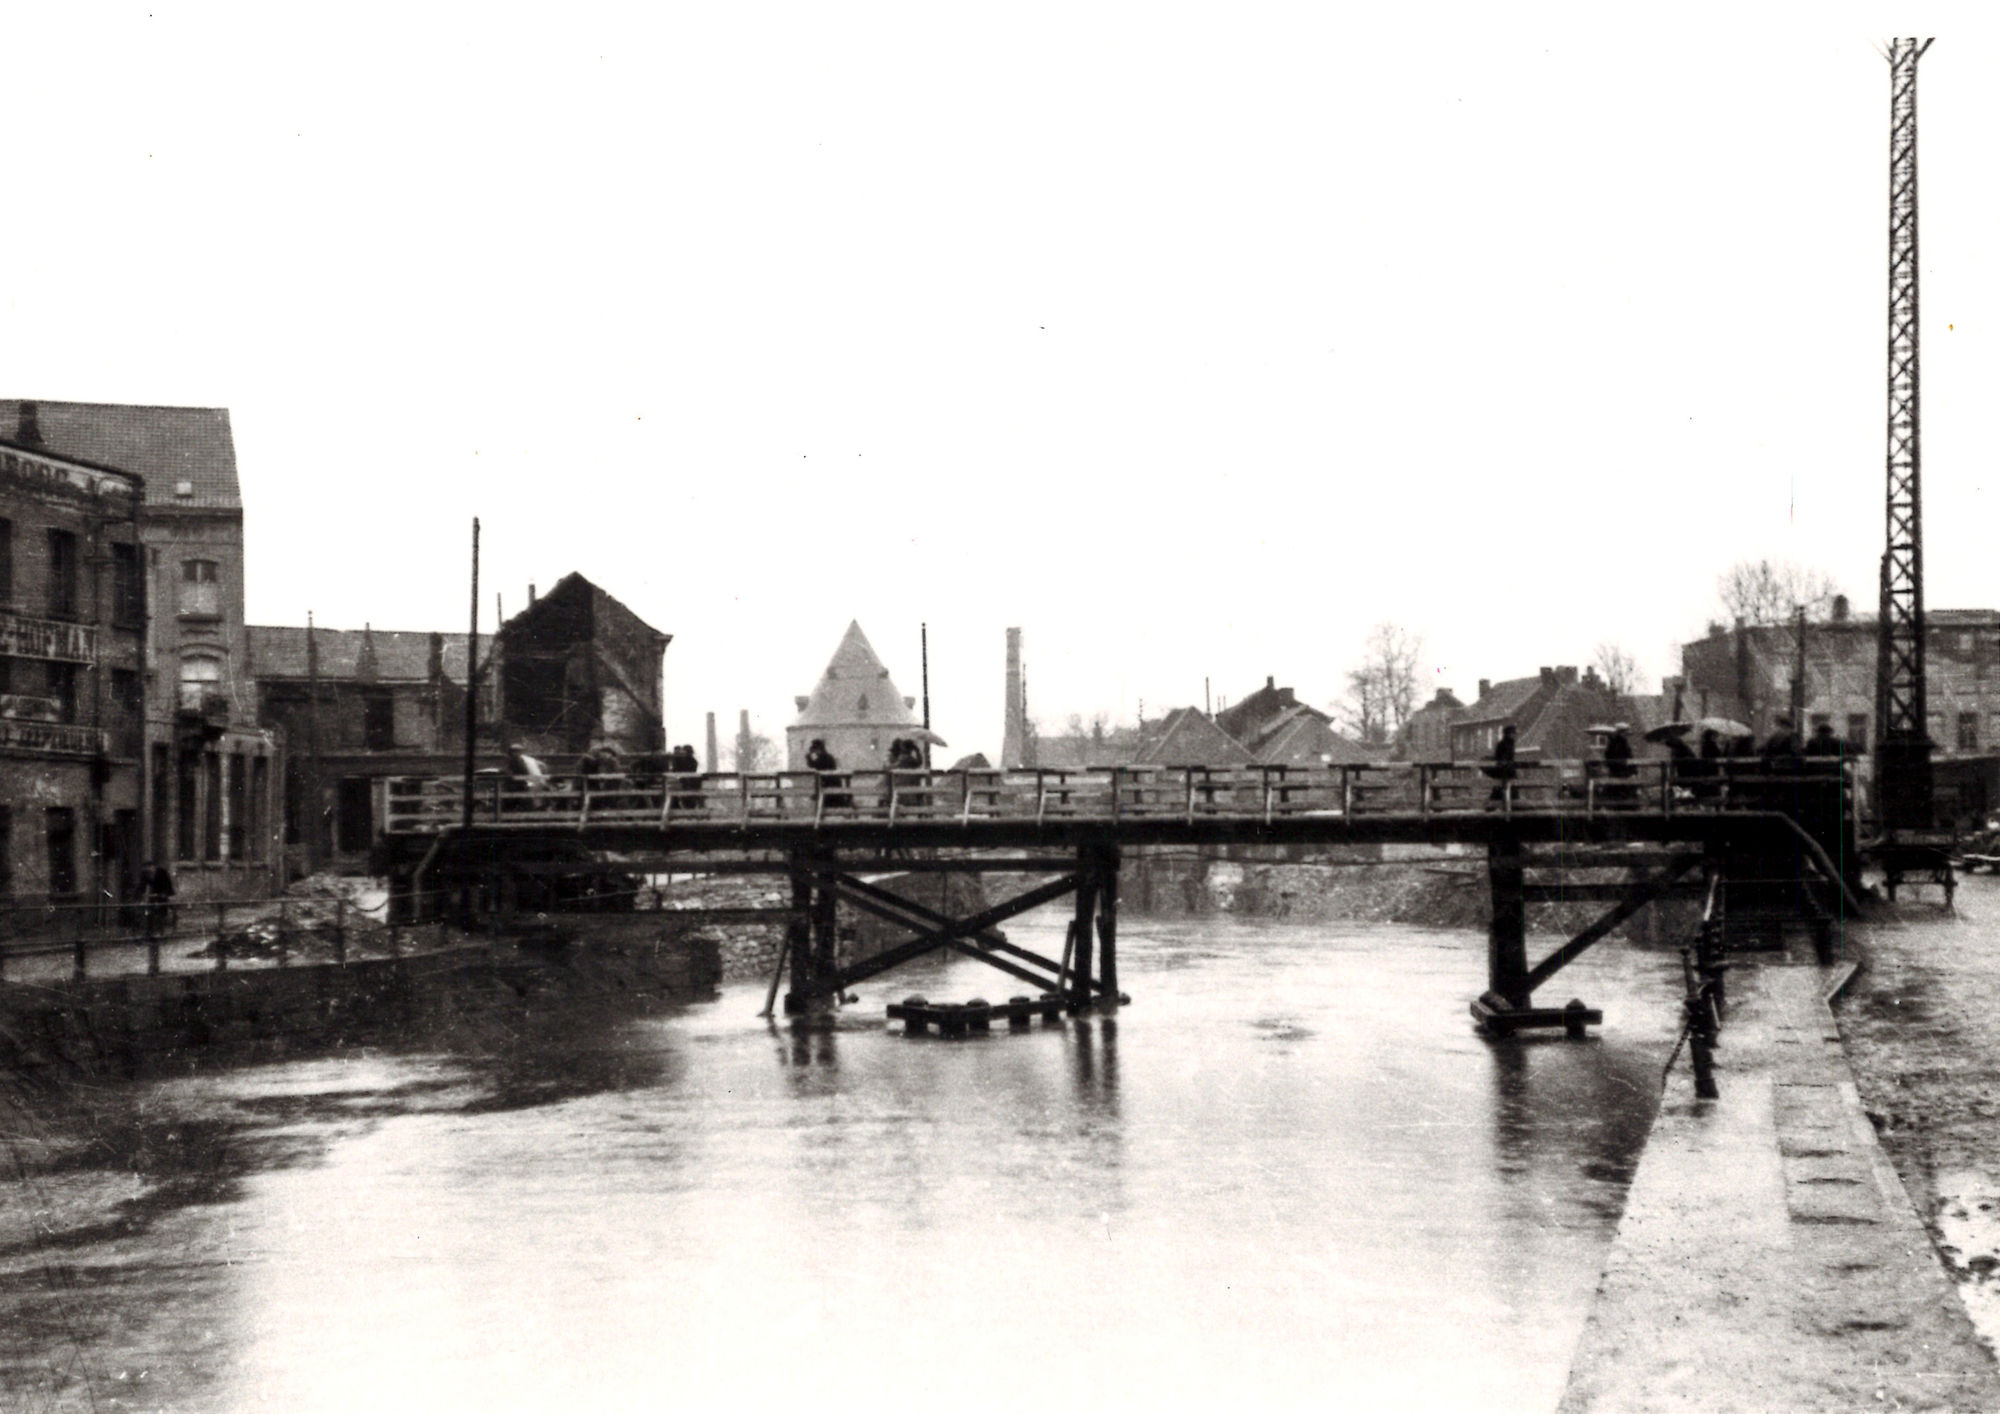 Leiebrug (noodbrug) 1945